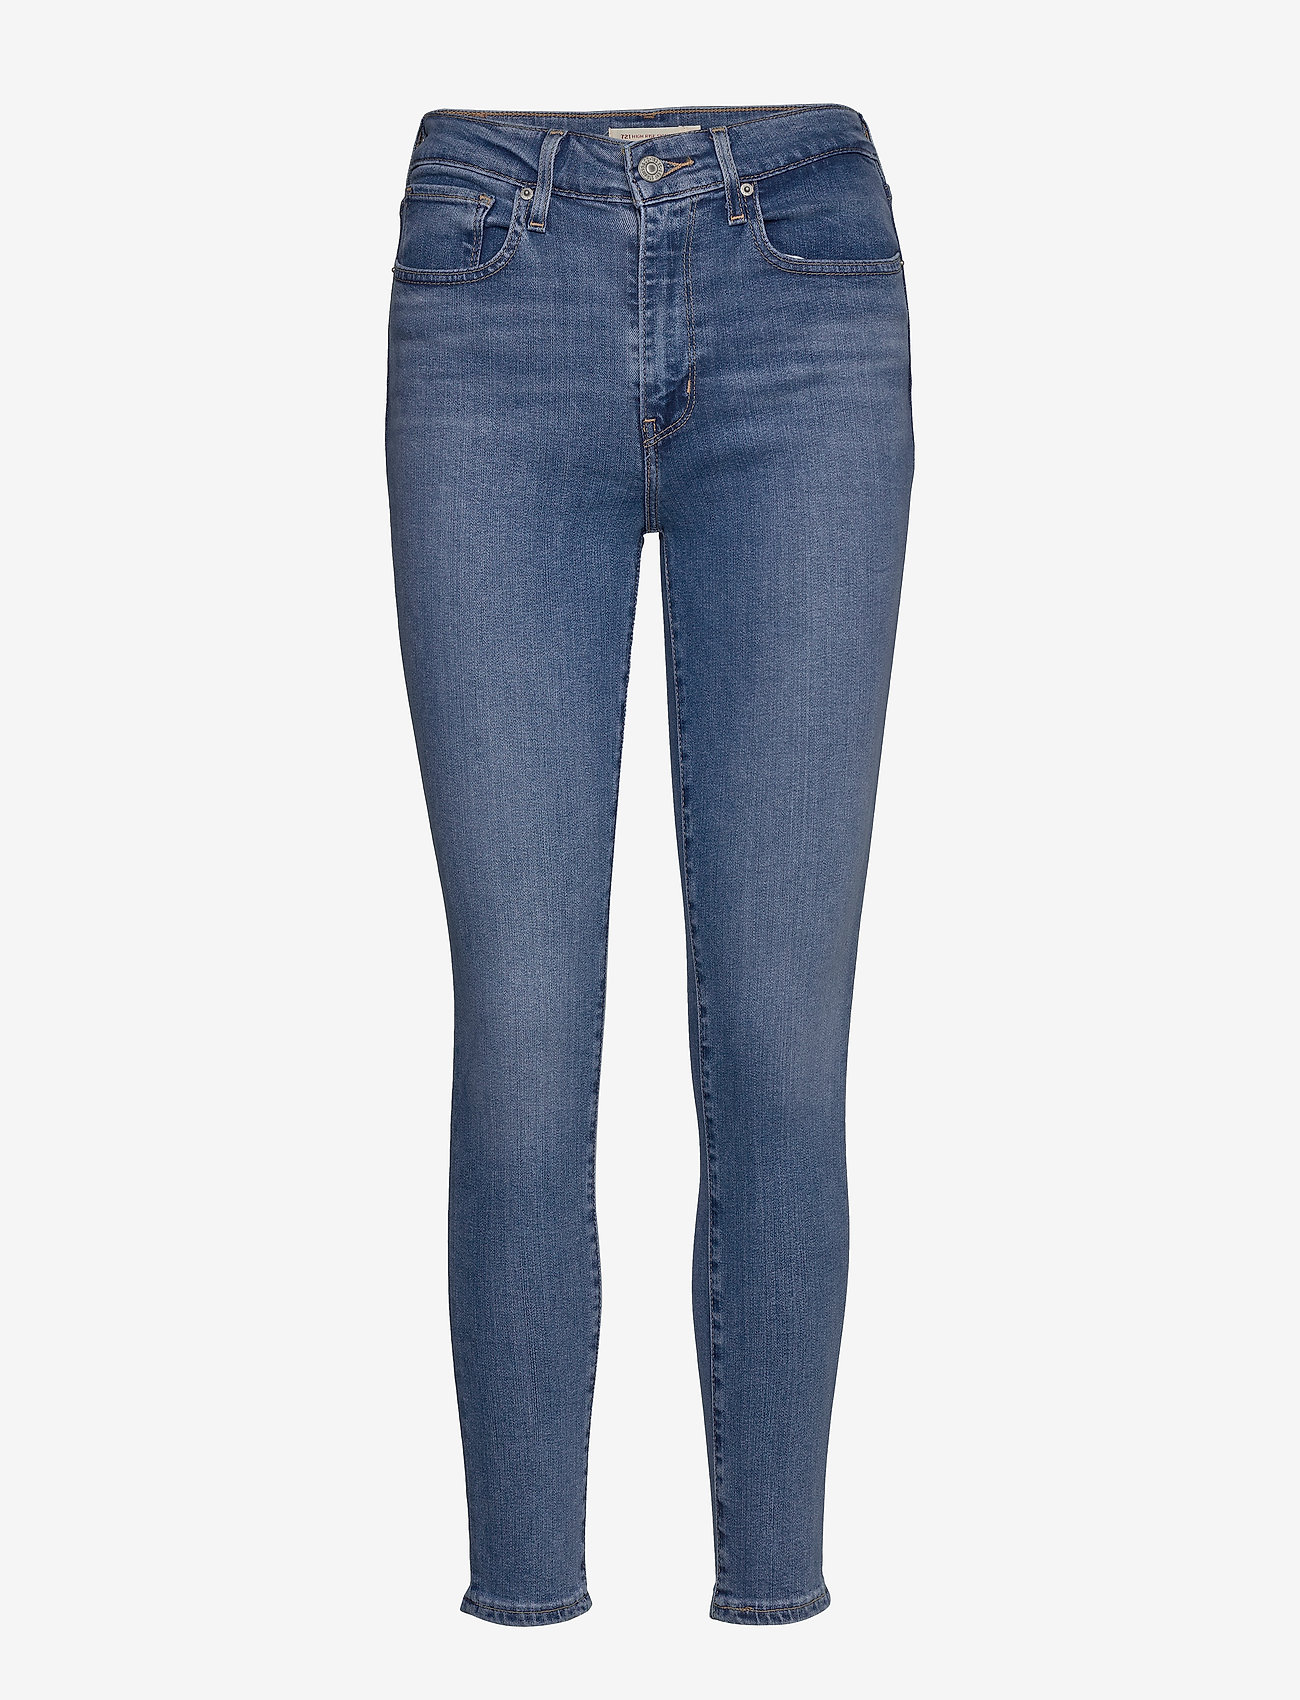 LEVI´S Women - 721 HIGH RISE SKINNY RIO HUSTL - skinny jeans - light indigo - worn in - 1